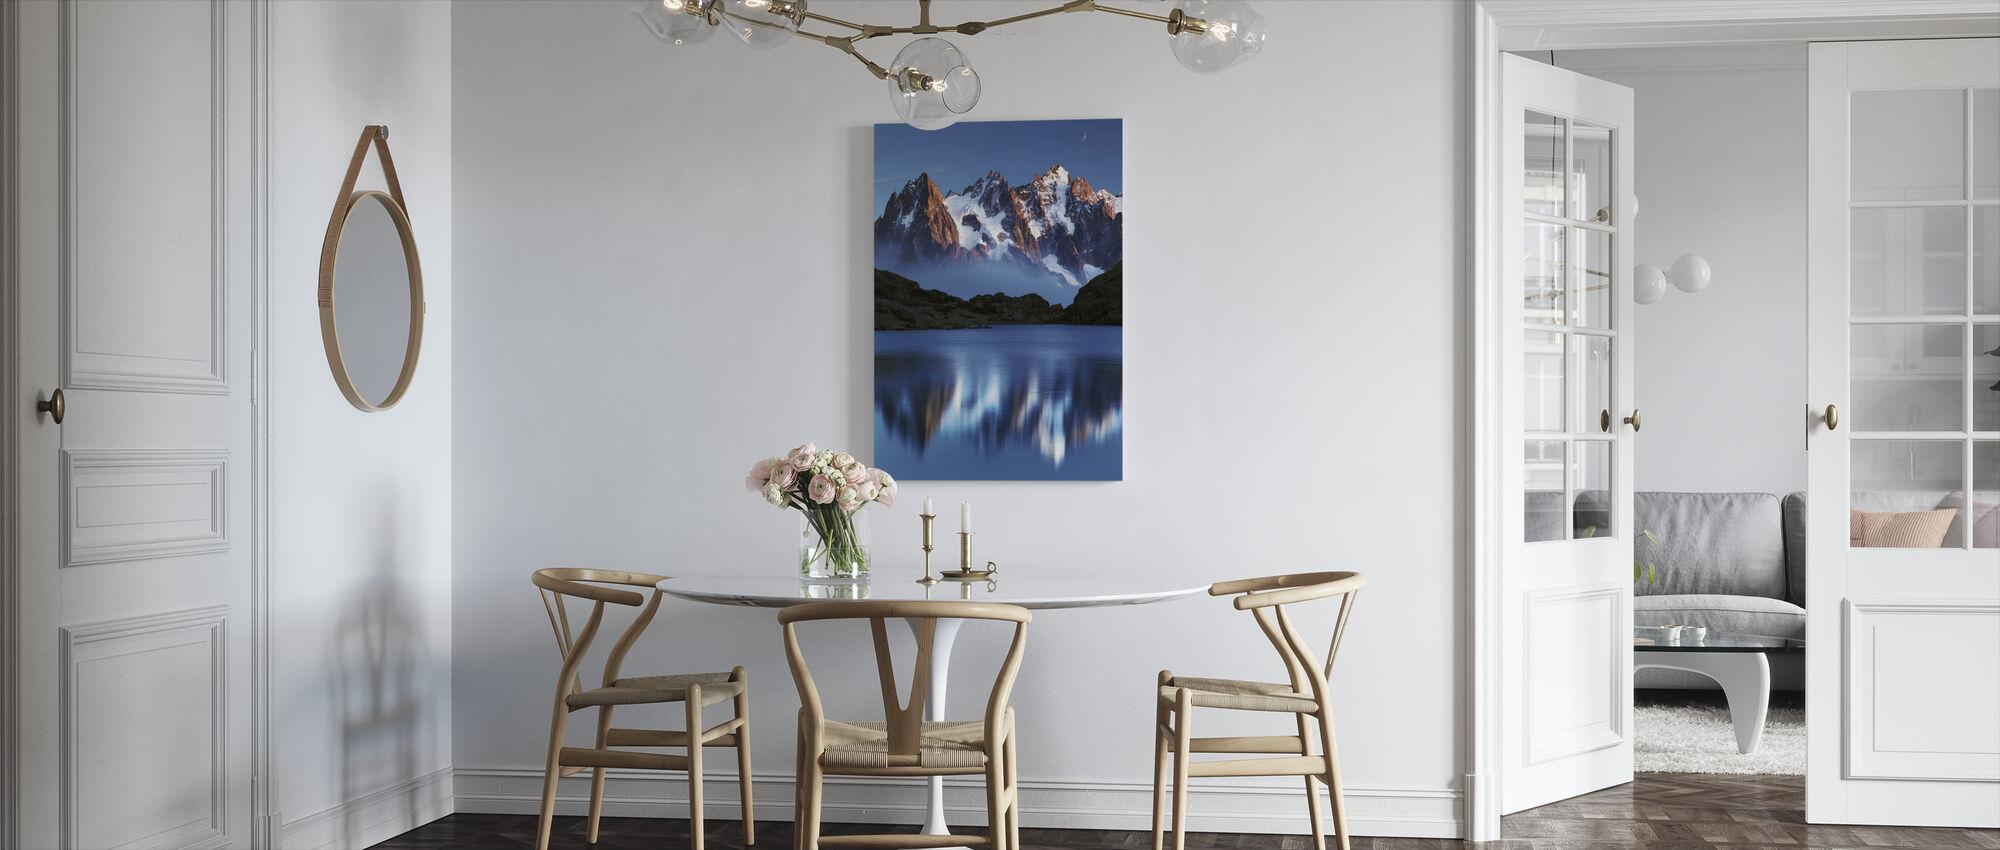 Blue Mountain Mirror - Canvas print - Kitchen